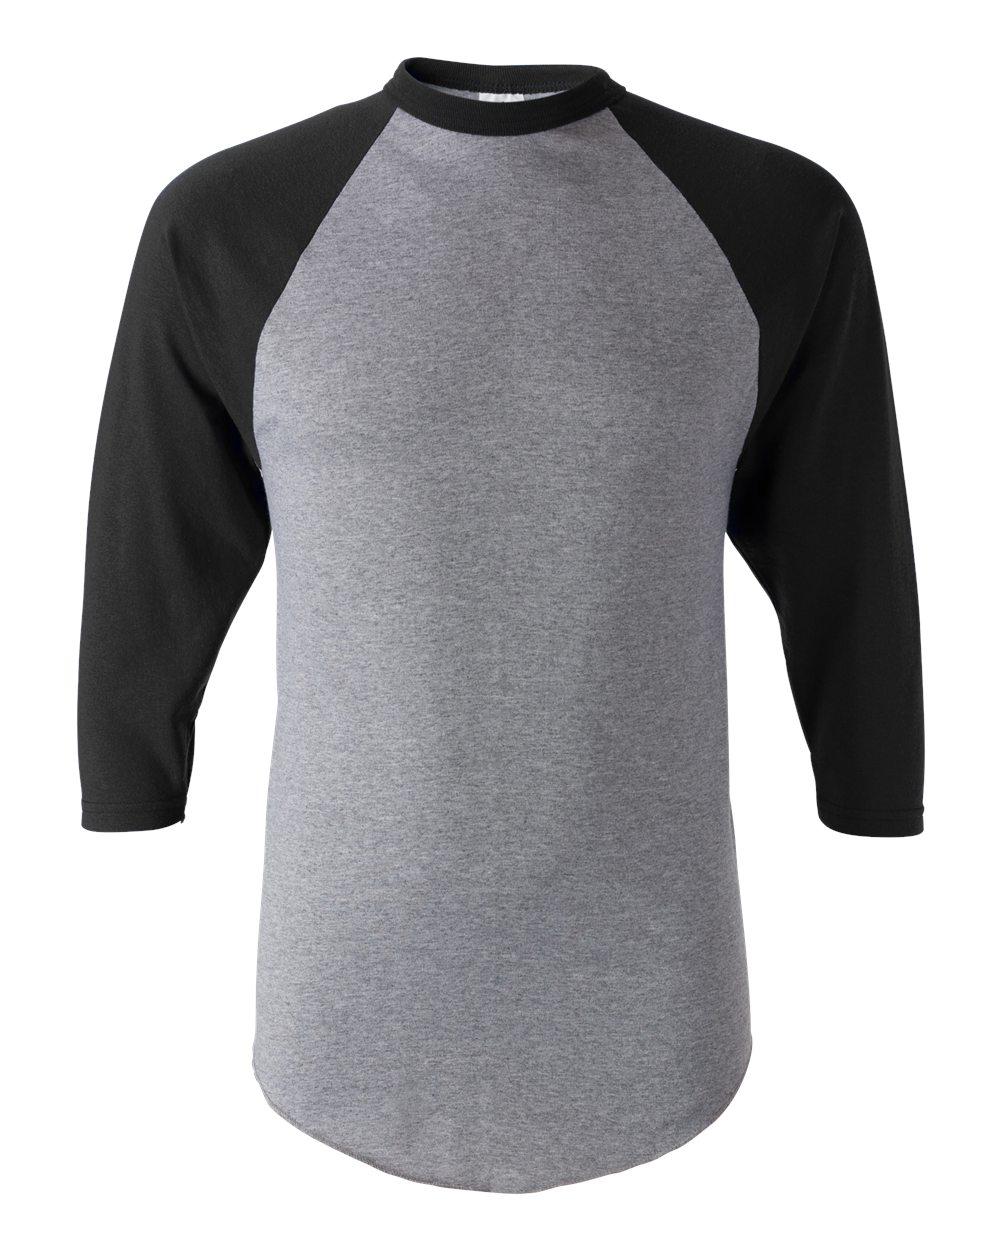 the best attitude 22242 06f48 Augusta Sportswear 4420 - Men's Three-Quarter Sleeve Baseball Jersey